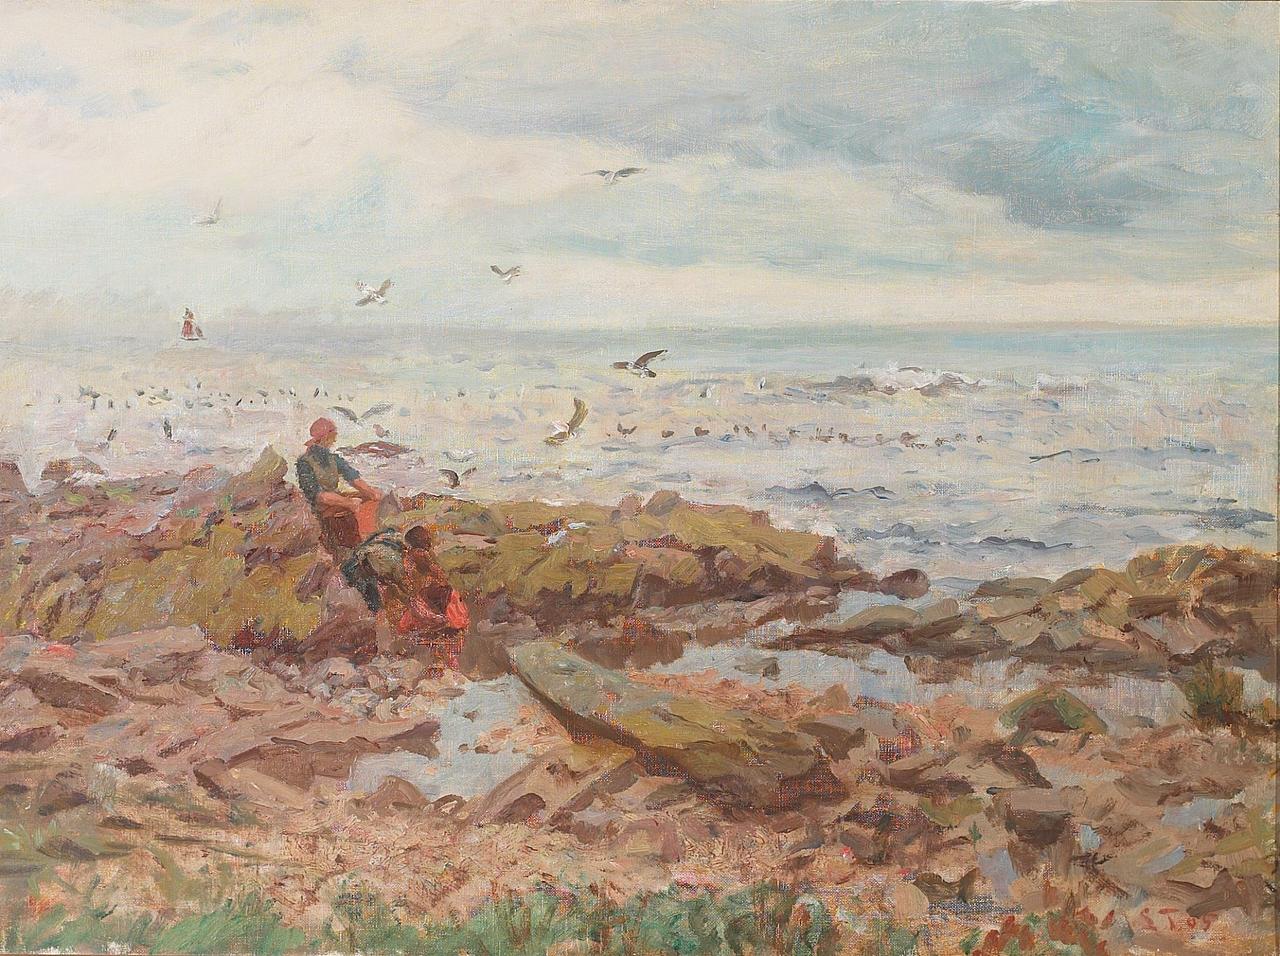 Laurits Tuxen - Figurer pе stranden. Бретань - 1905.png